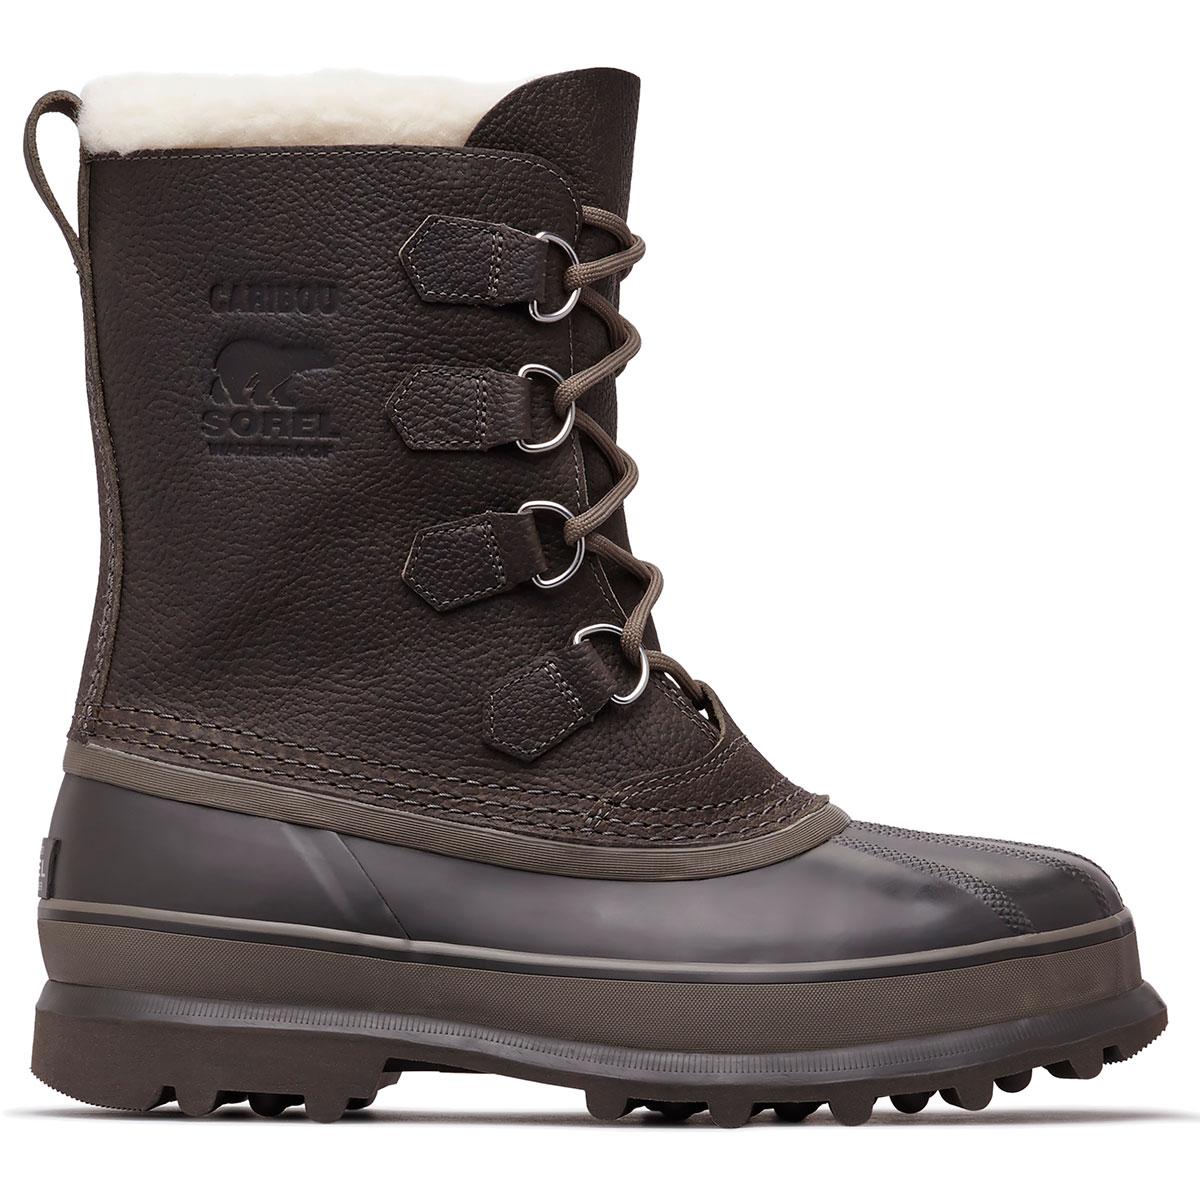 Sorel Men's Caribou Wool Winter Boots - Black, 11